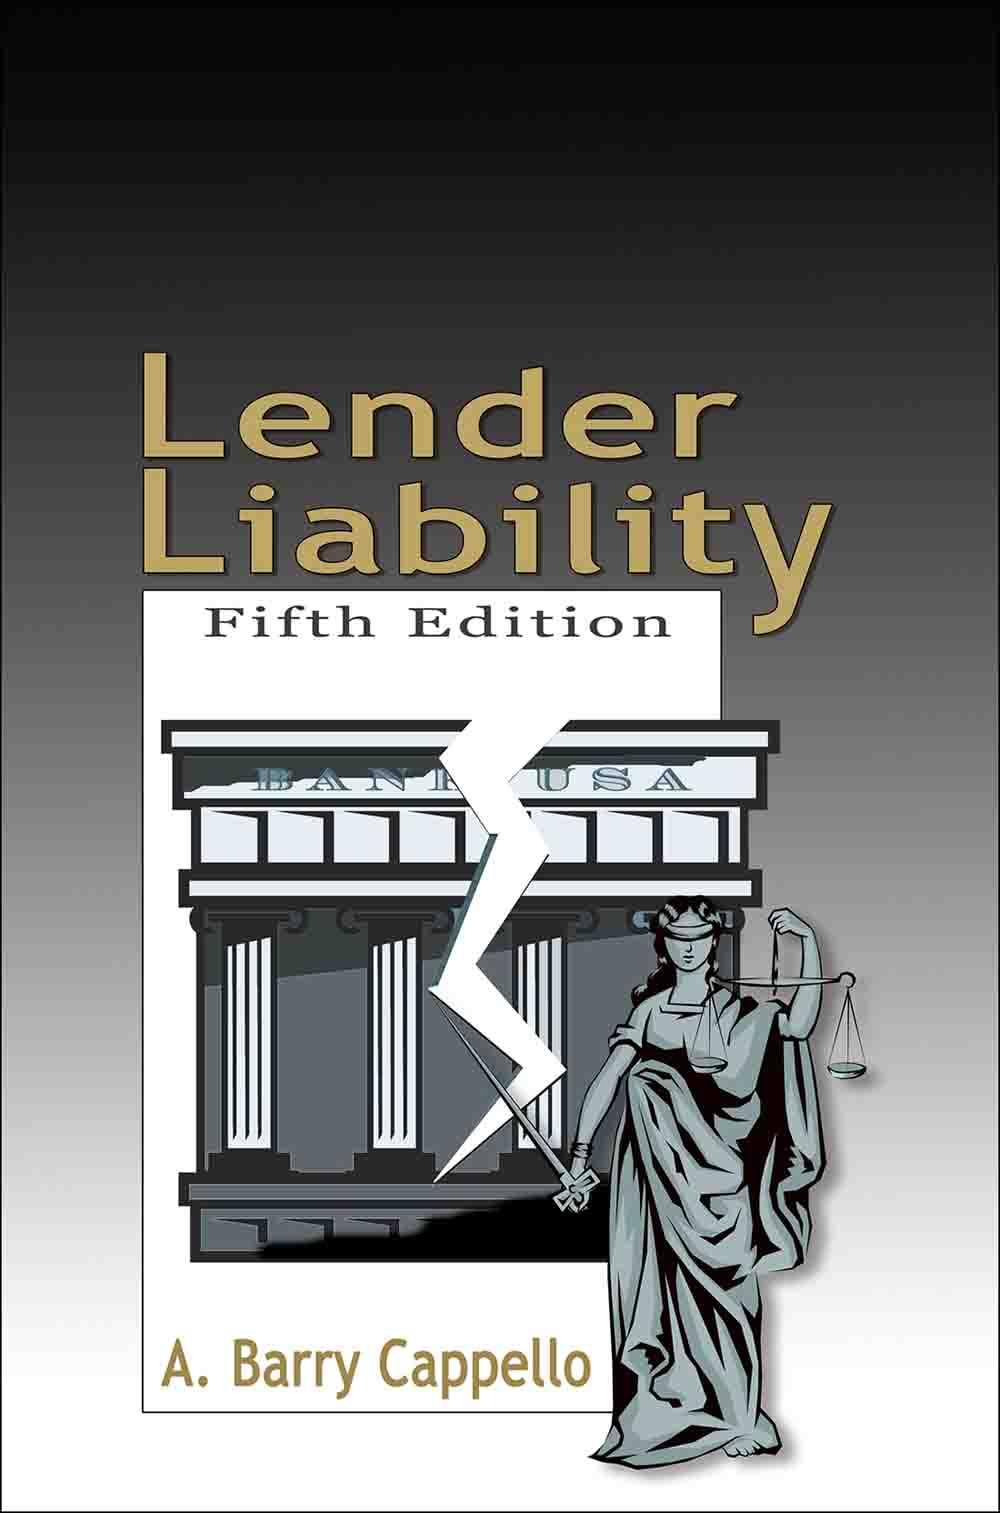 Lender Liability, 5th Edition